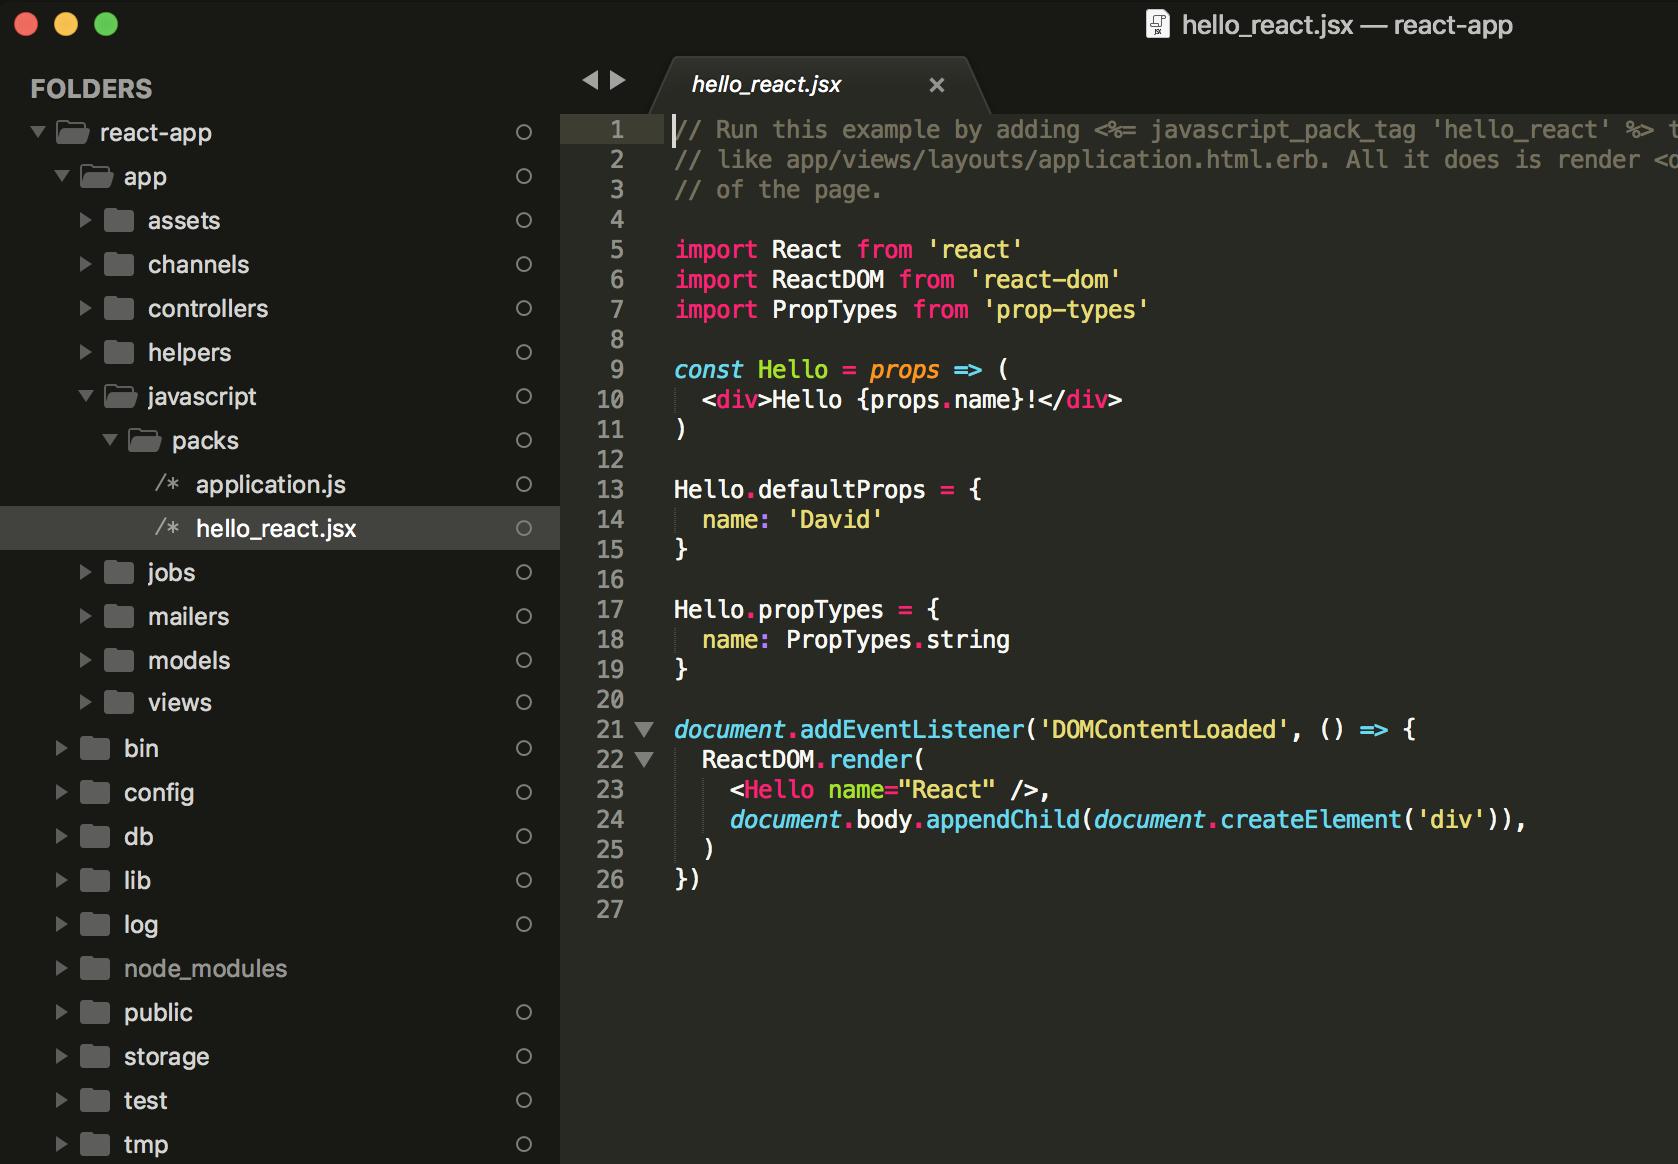 Javascript Packs Folder